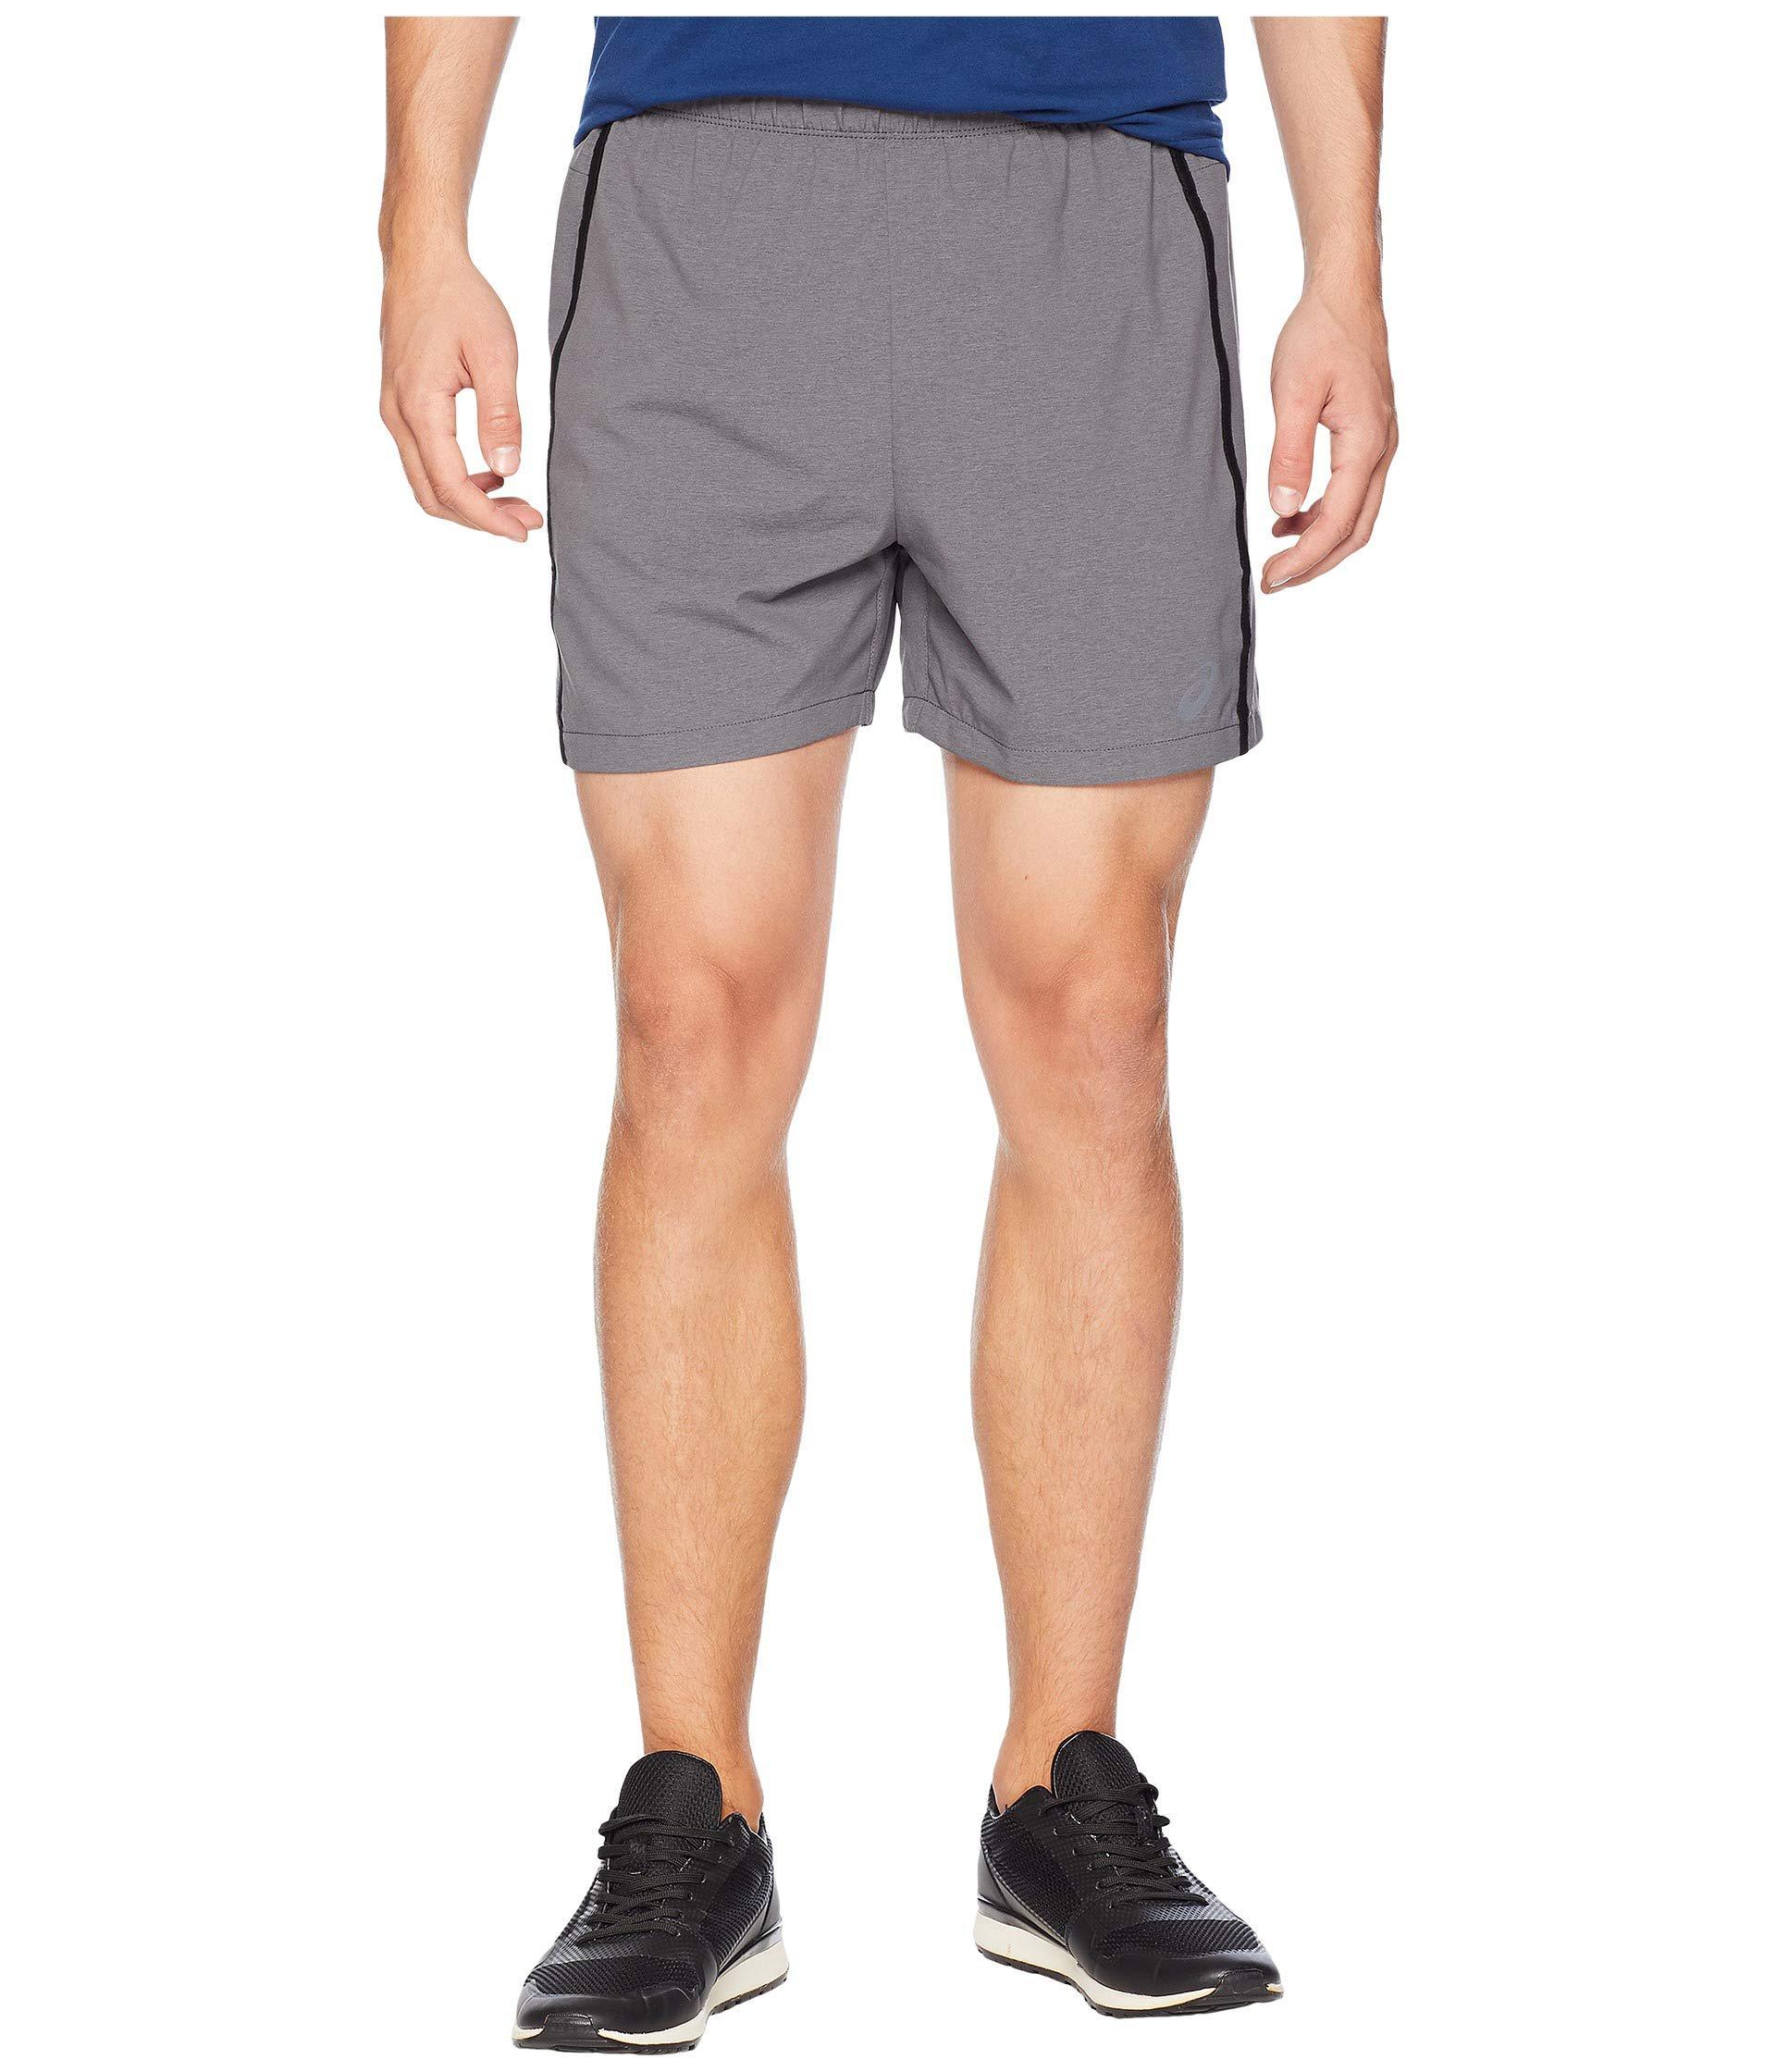 abcdd593aa Lyst - Asics 5 Shorts (dark Grey Heather) Men's Shorts in Gray for Men